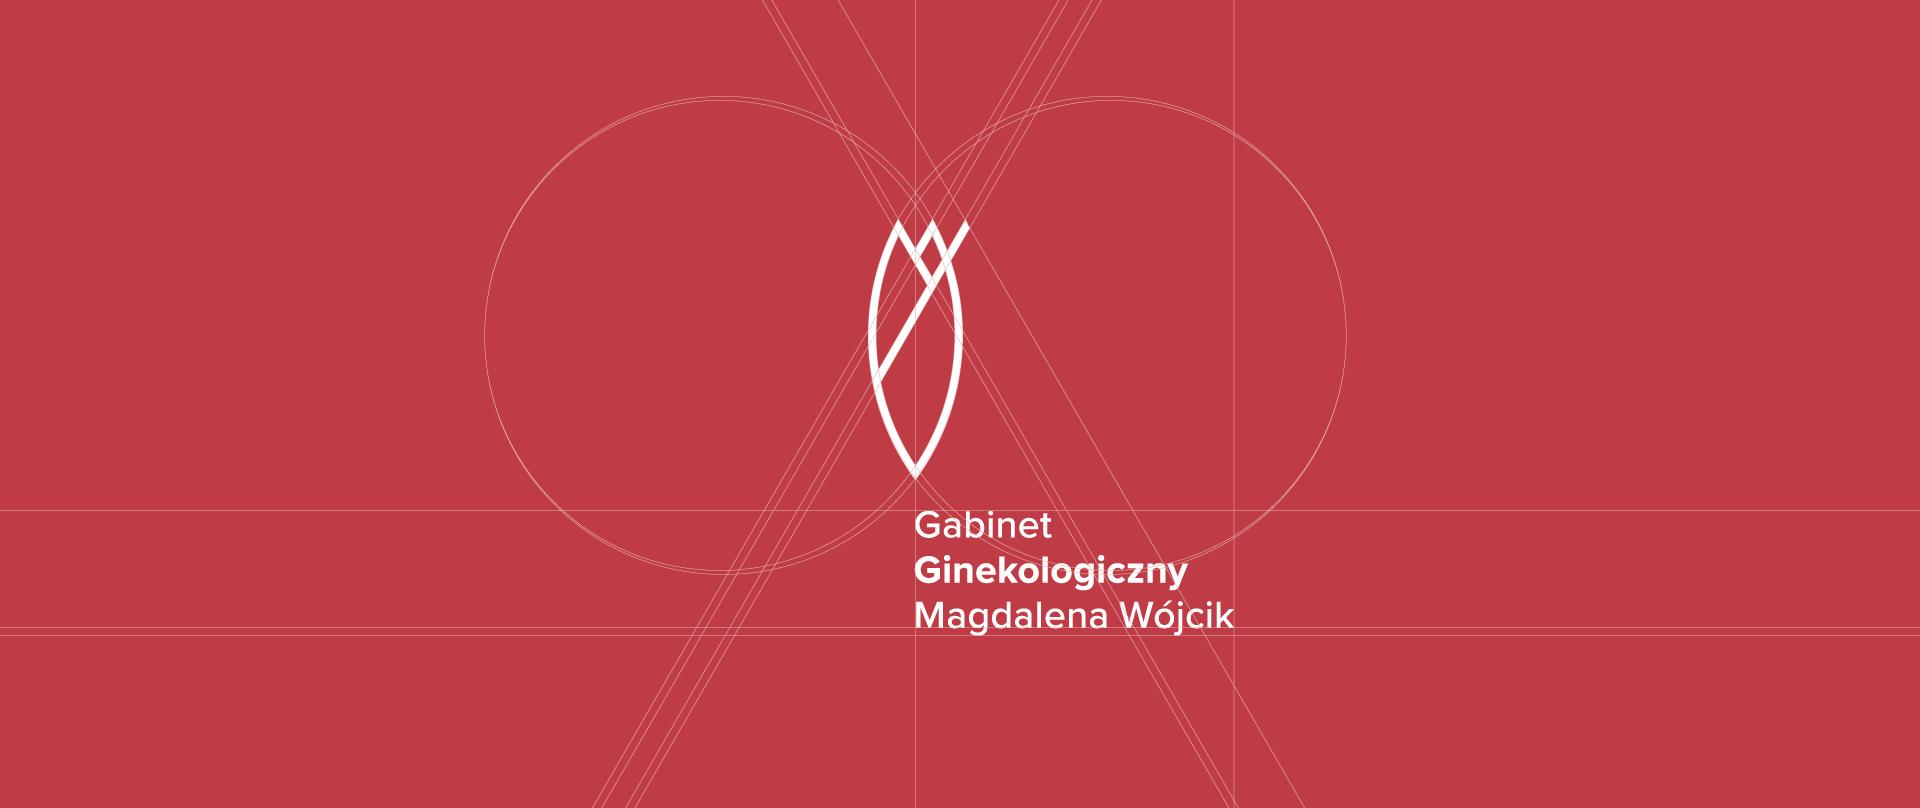 logo budowa znak siatka ginekolog